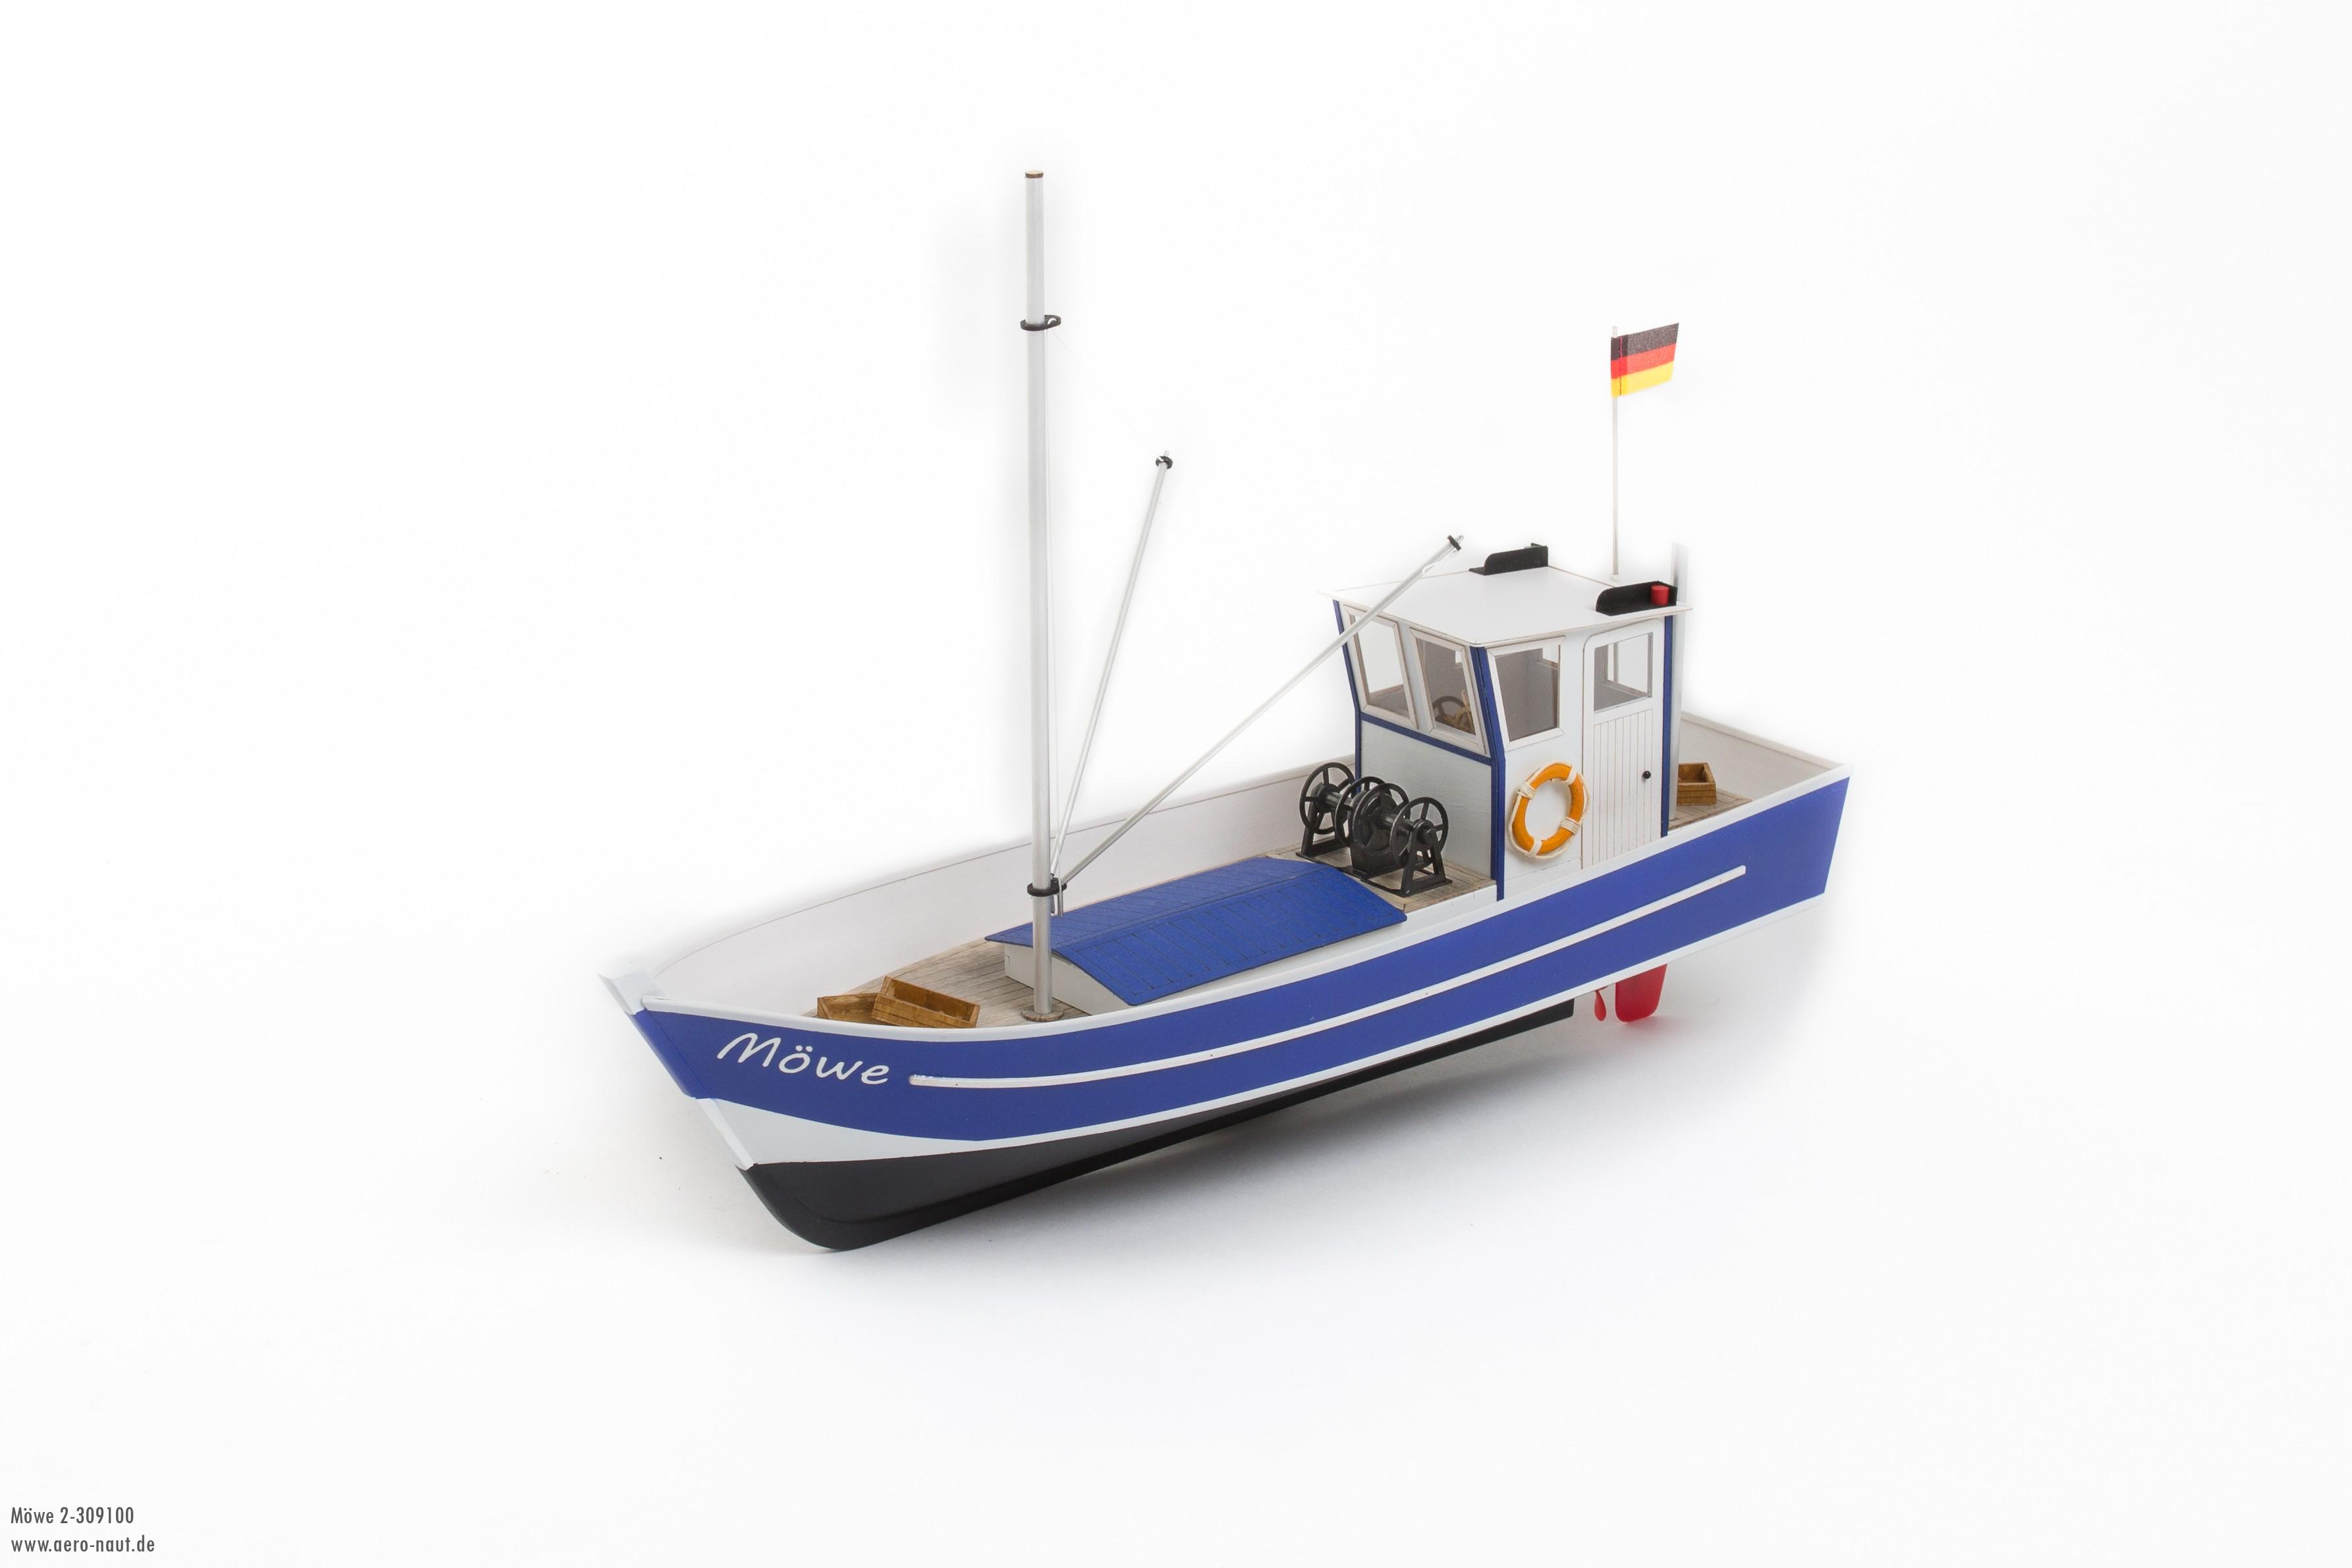 Möwe 2 Rybářská loď stavebnice od Aero-Naut